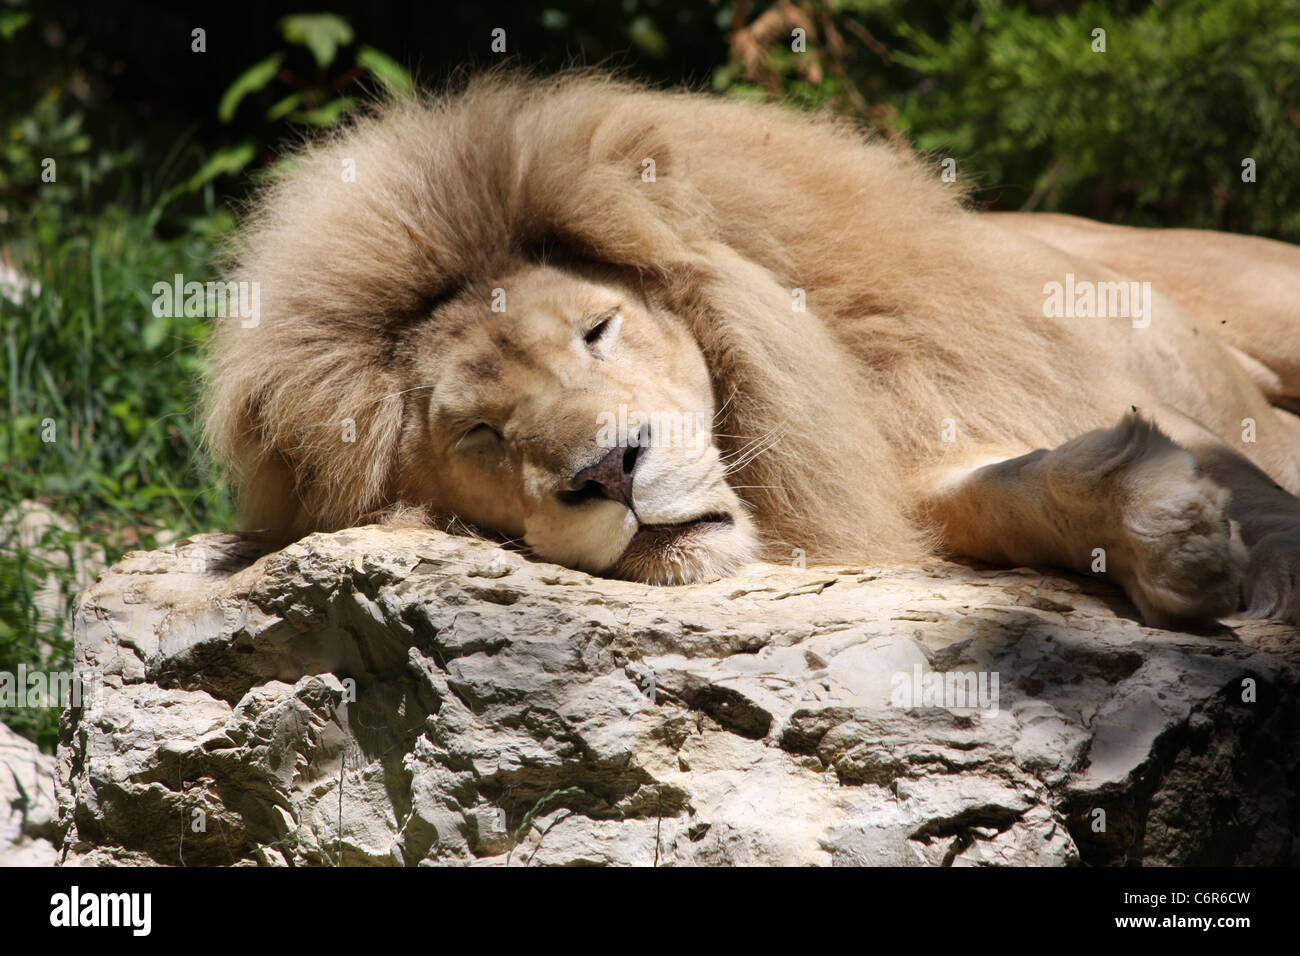 Sleeping Lion on Rock - Stock Image